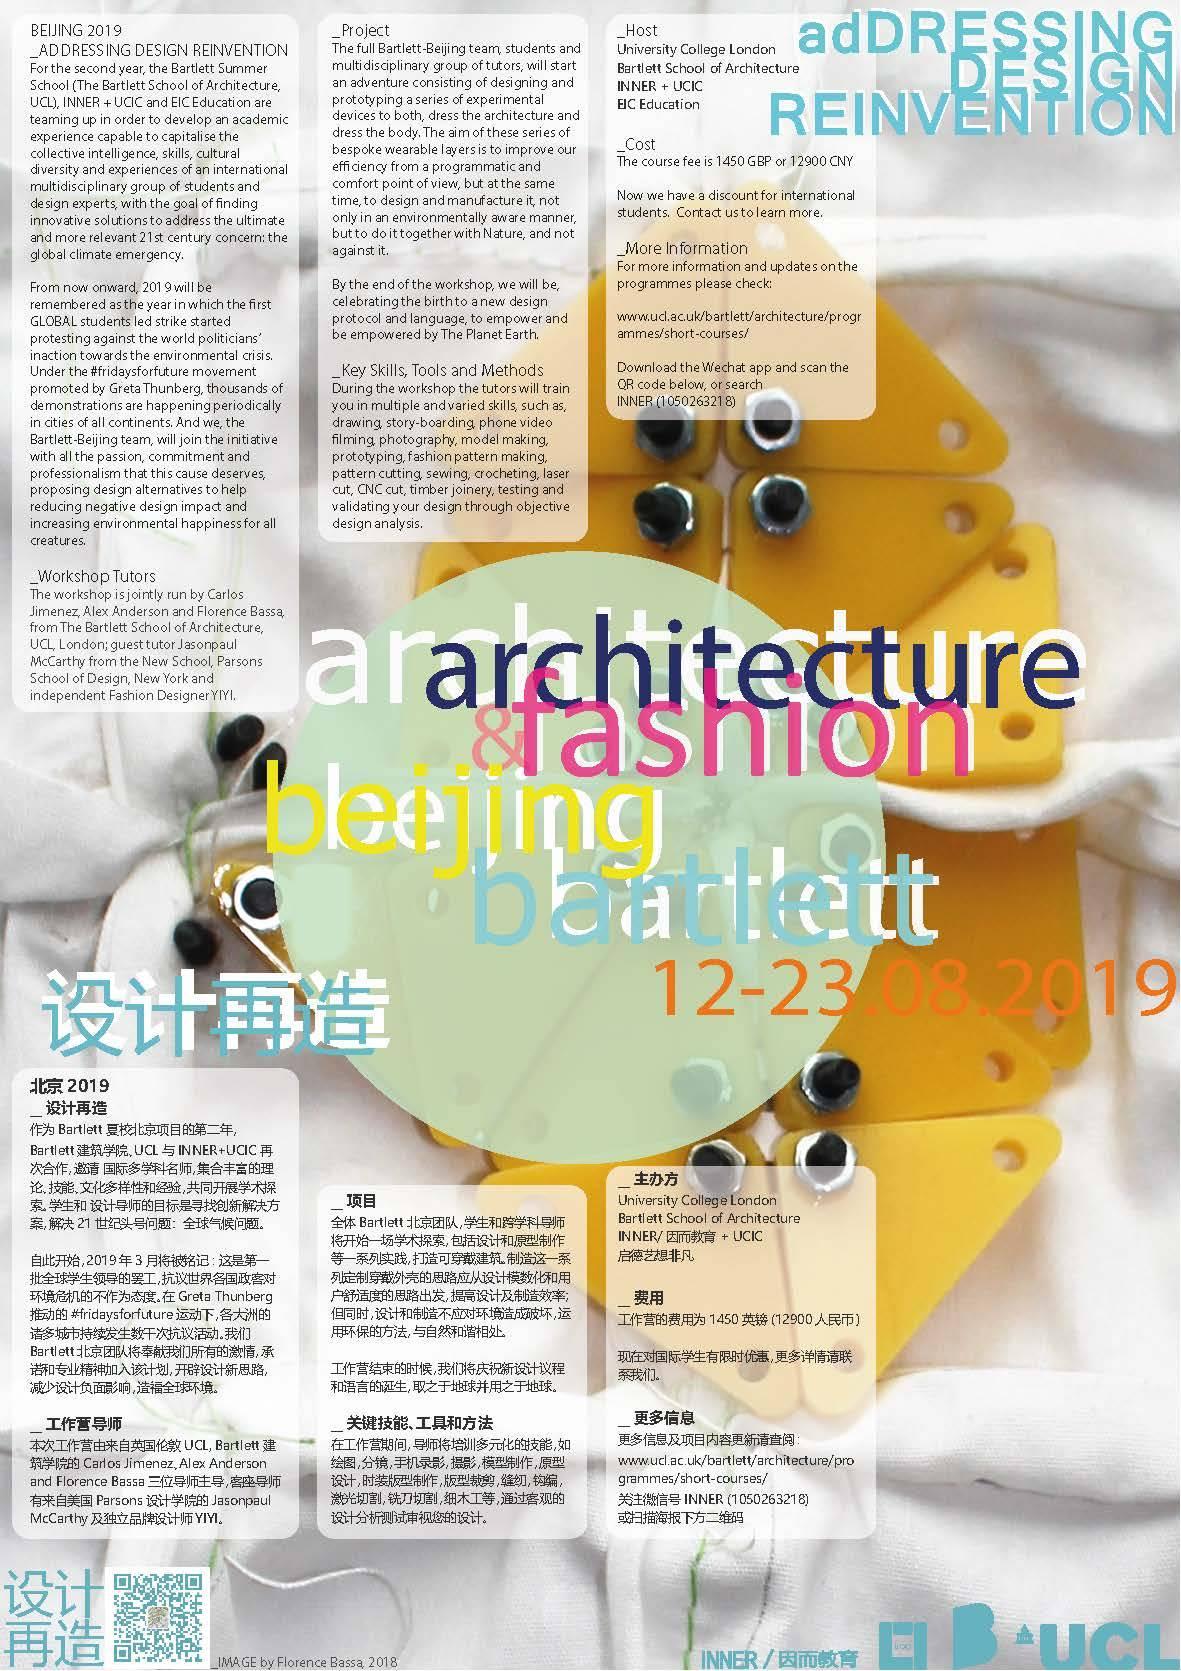 Bartlett Beijing Workshop Poster 2019